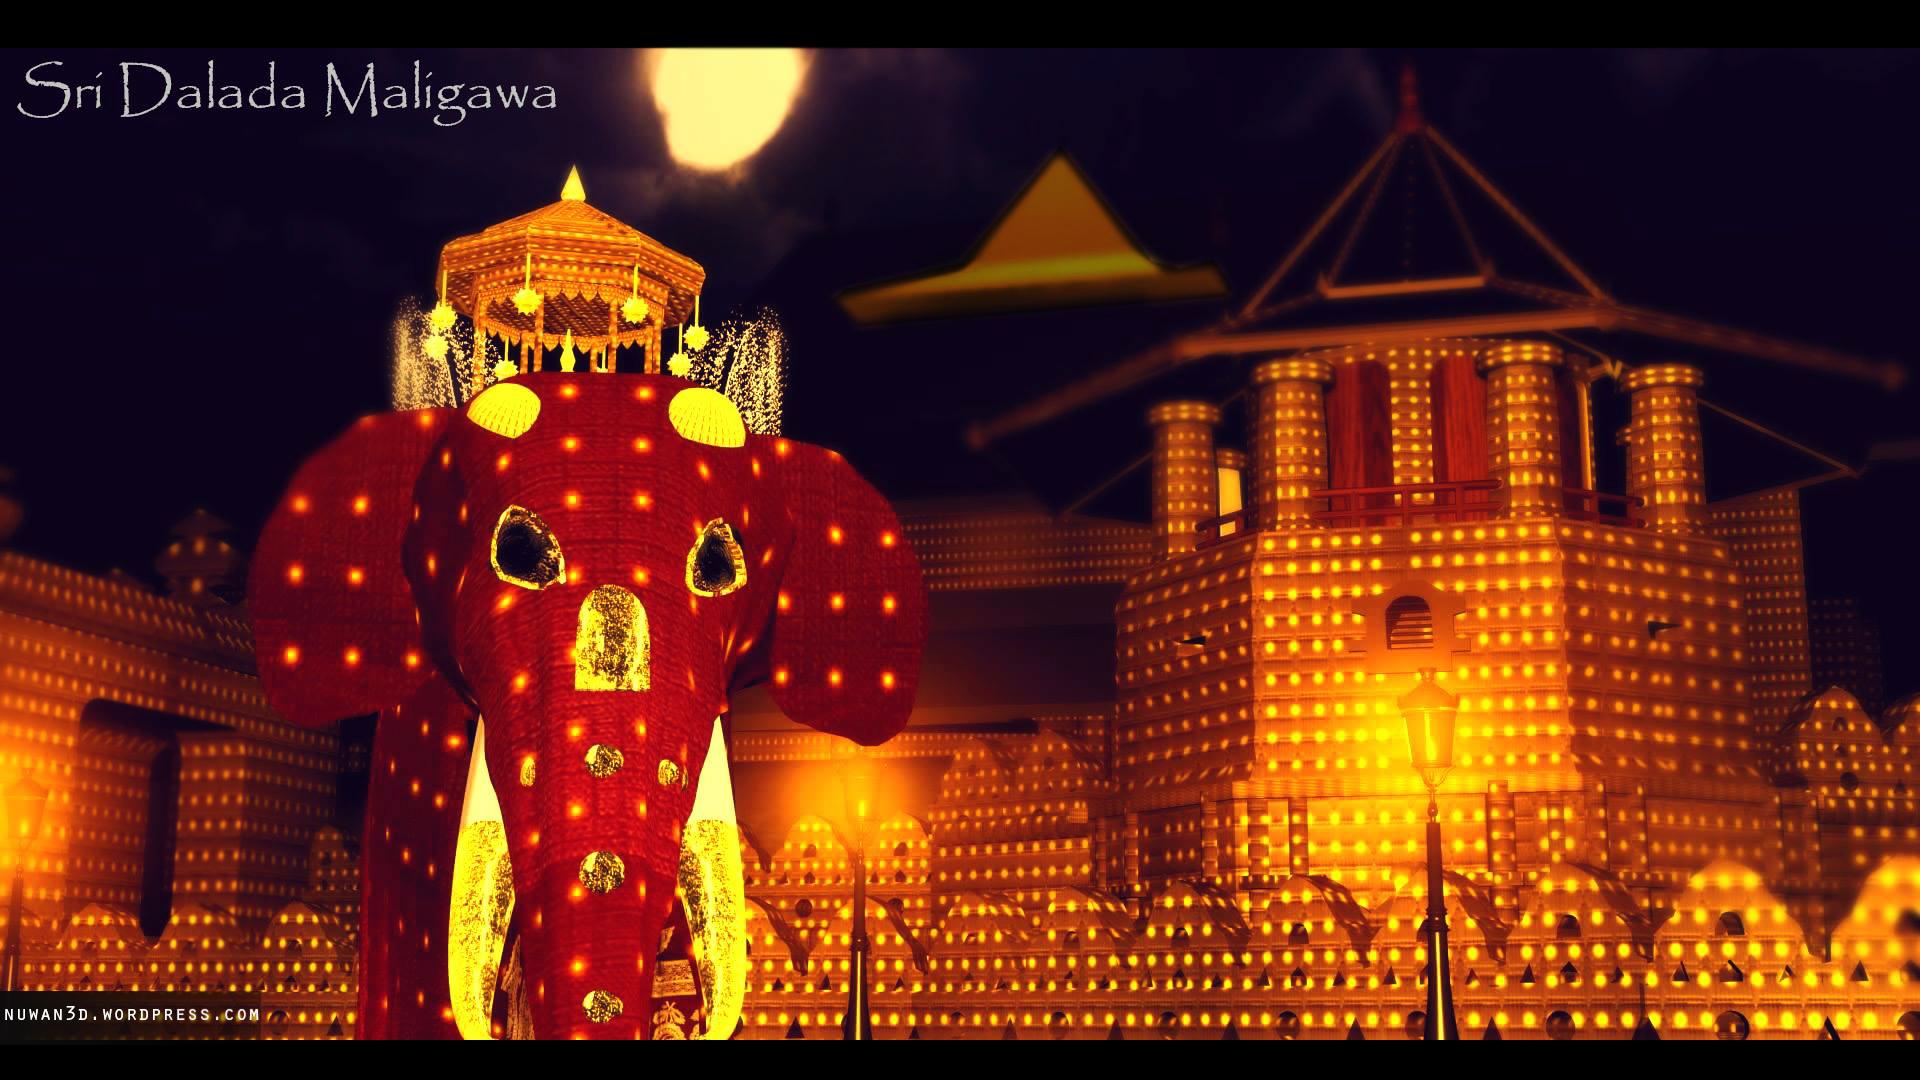 Www 3d Name Animation Wallpaper Com Sri Dalada Maligawa My First 3d Work Year 2009 Nuwan 3d